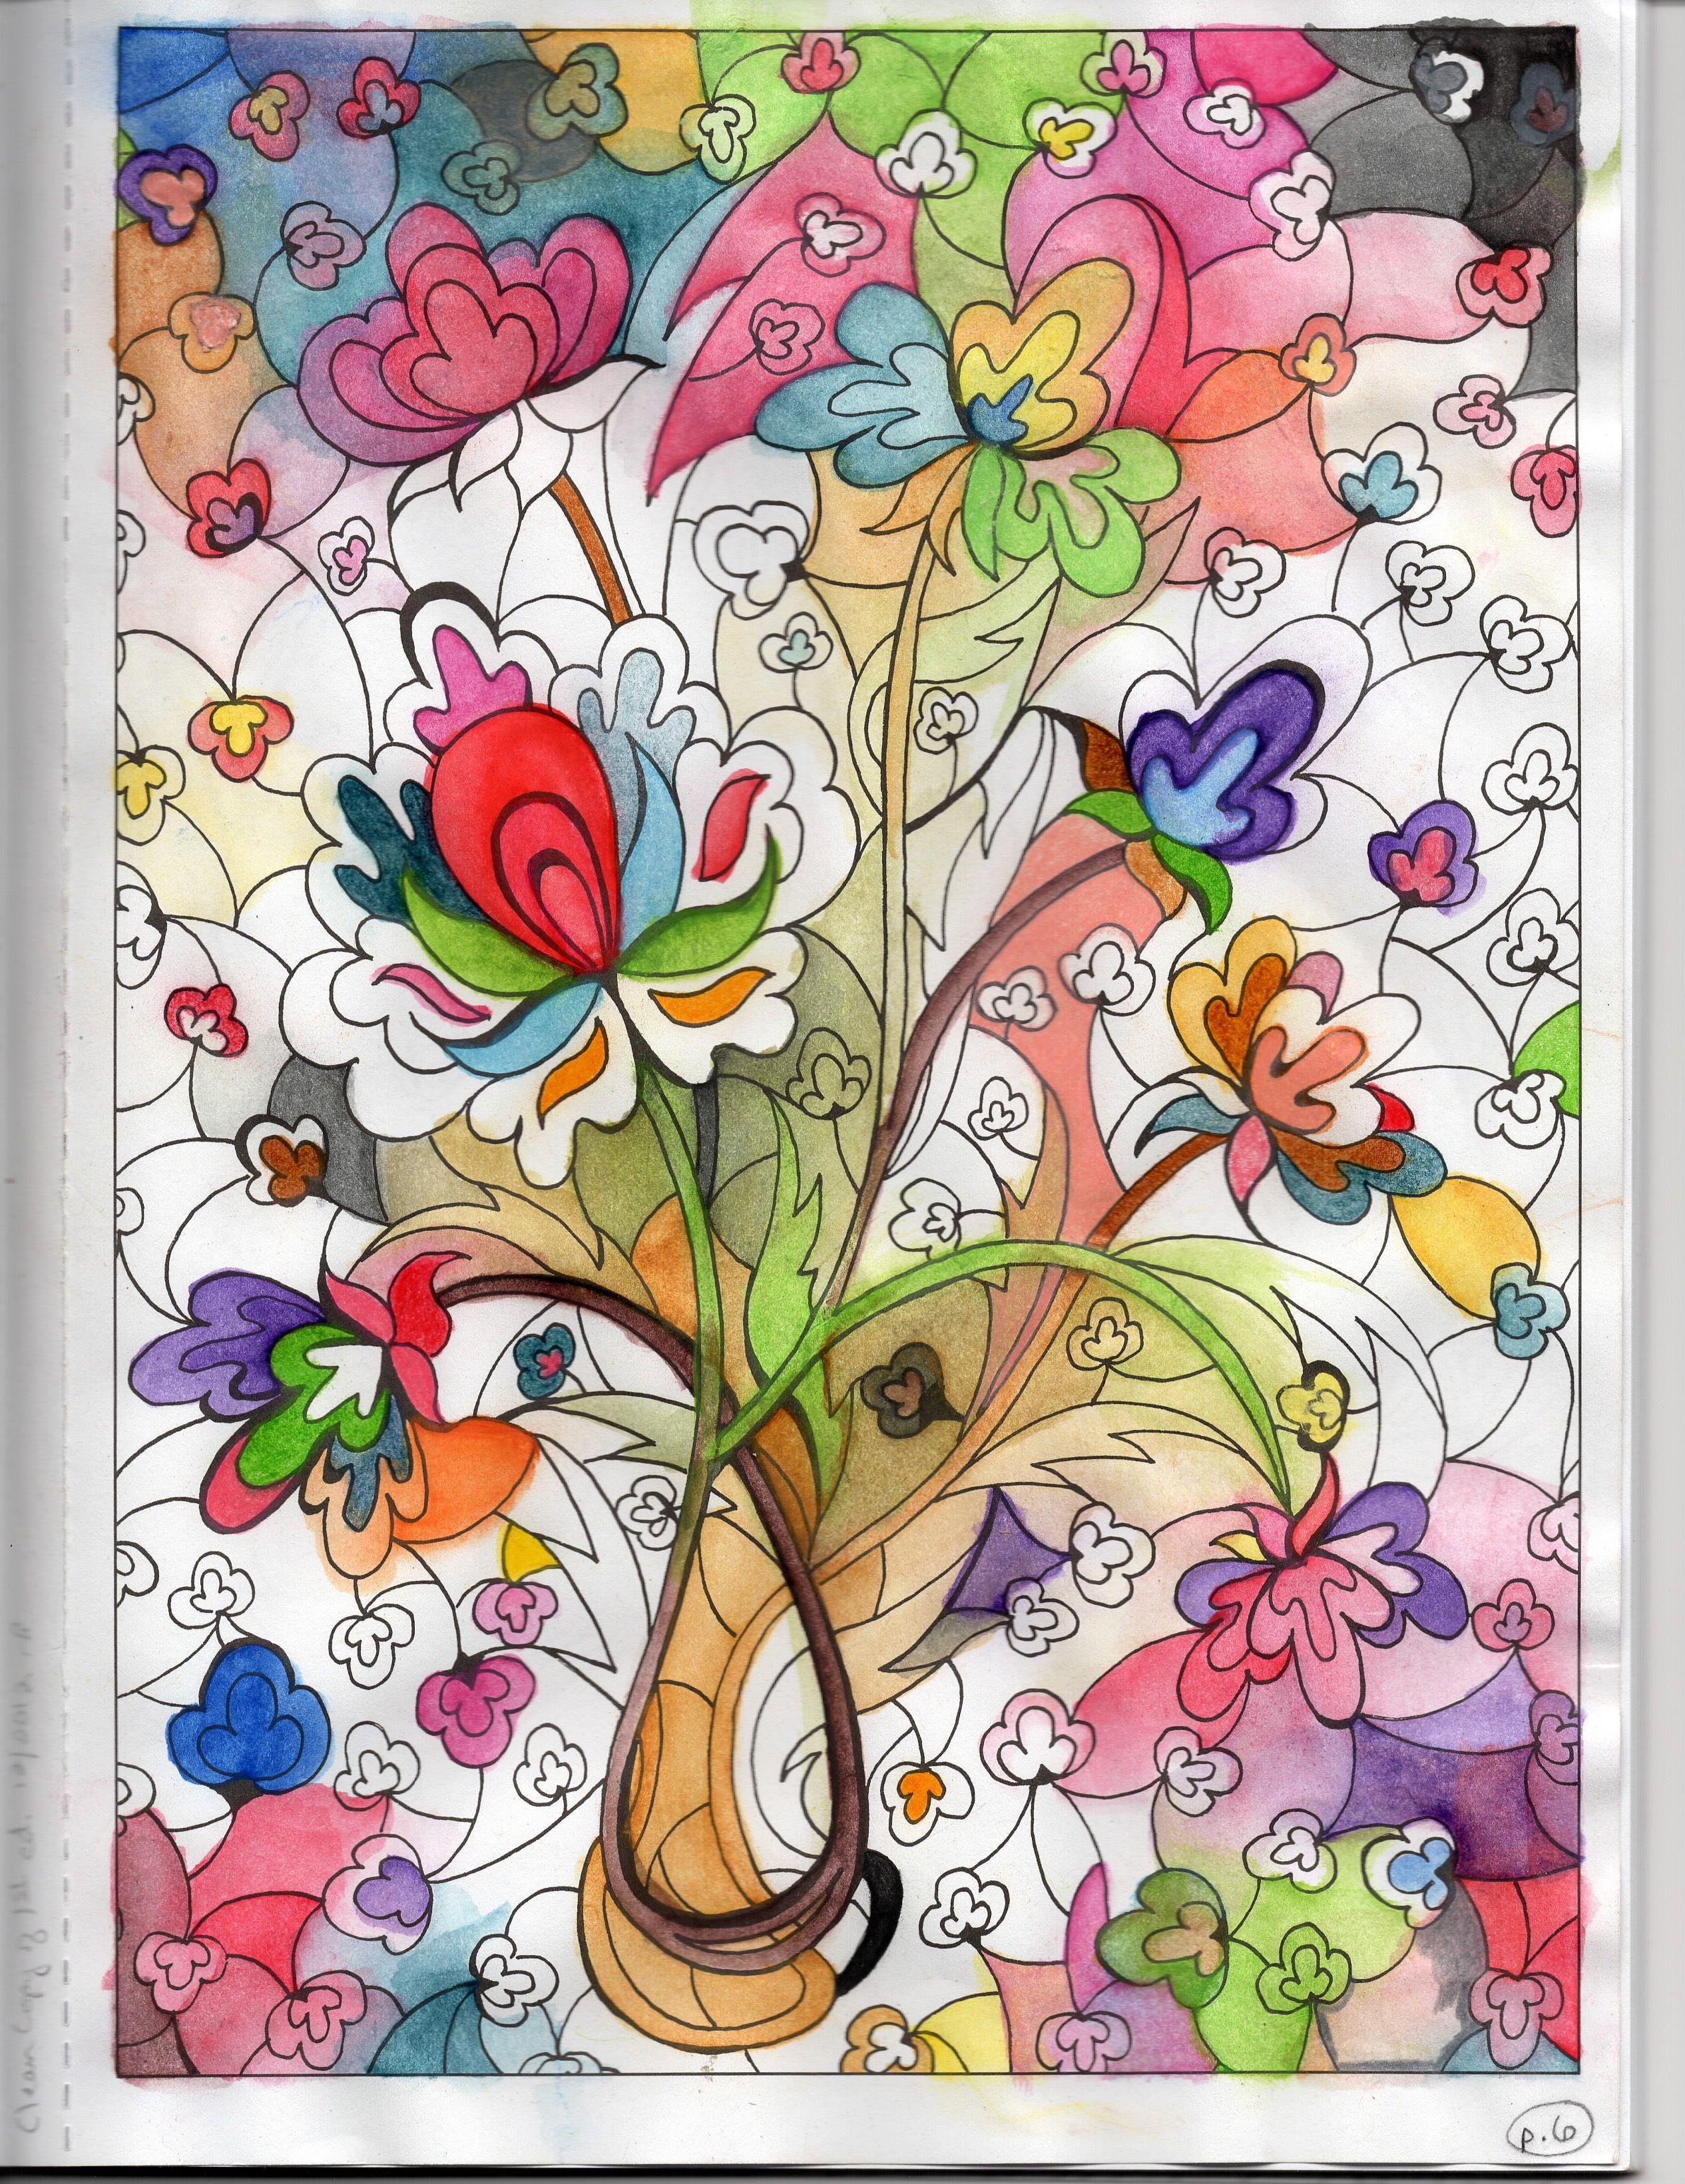 wip from creative haven dreamscapes coloring book by miryam adatto dover pub watercolor - Watercolor Coloring Book